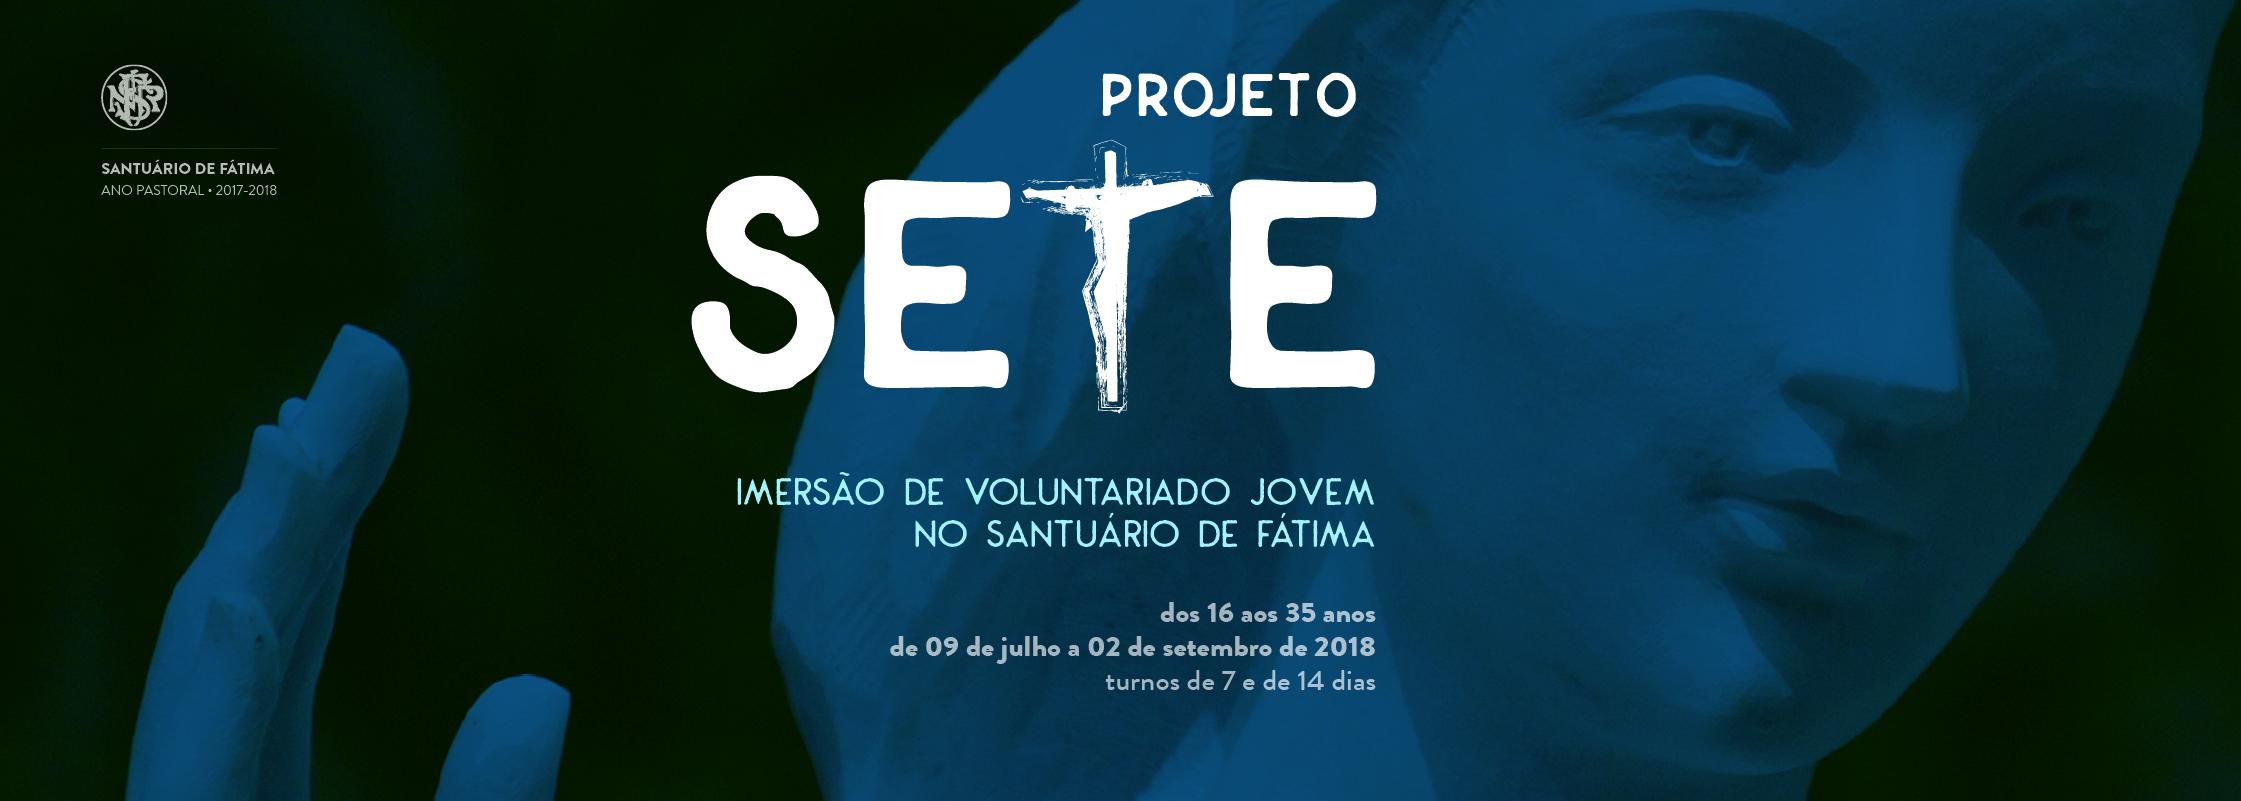 2018-05-16_Projeto_SETE_2.jpg